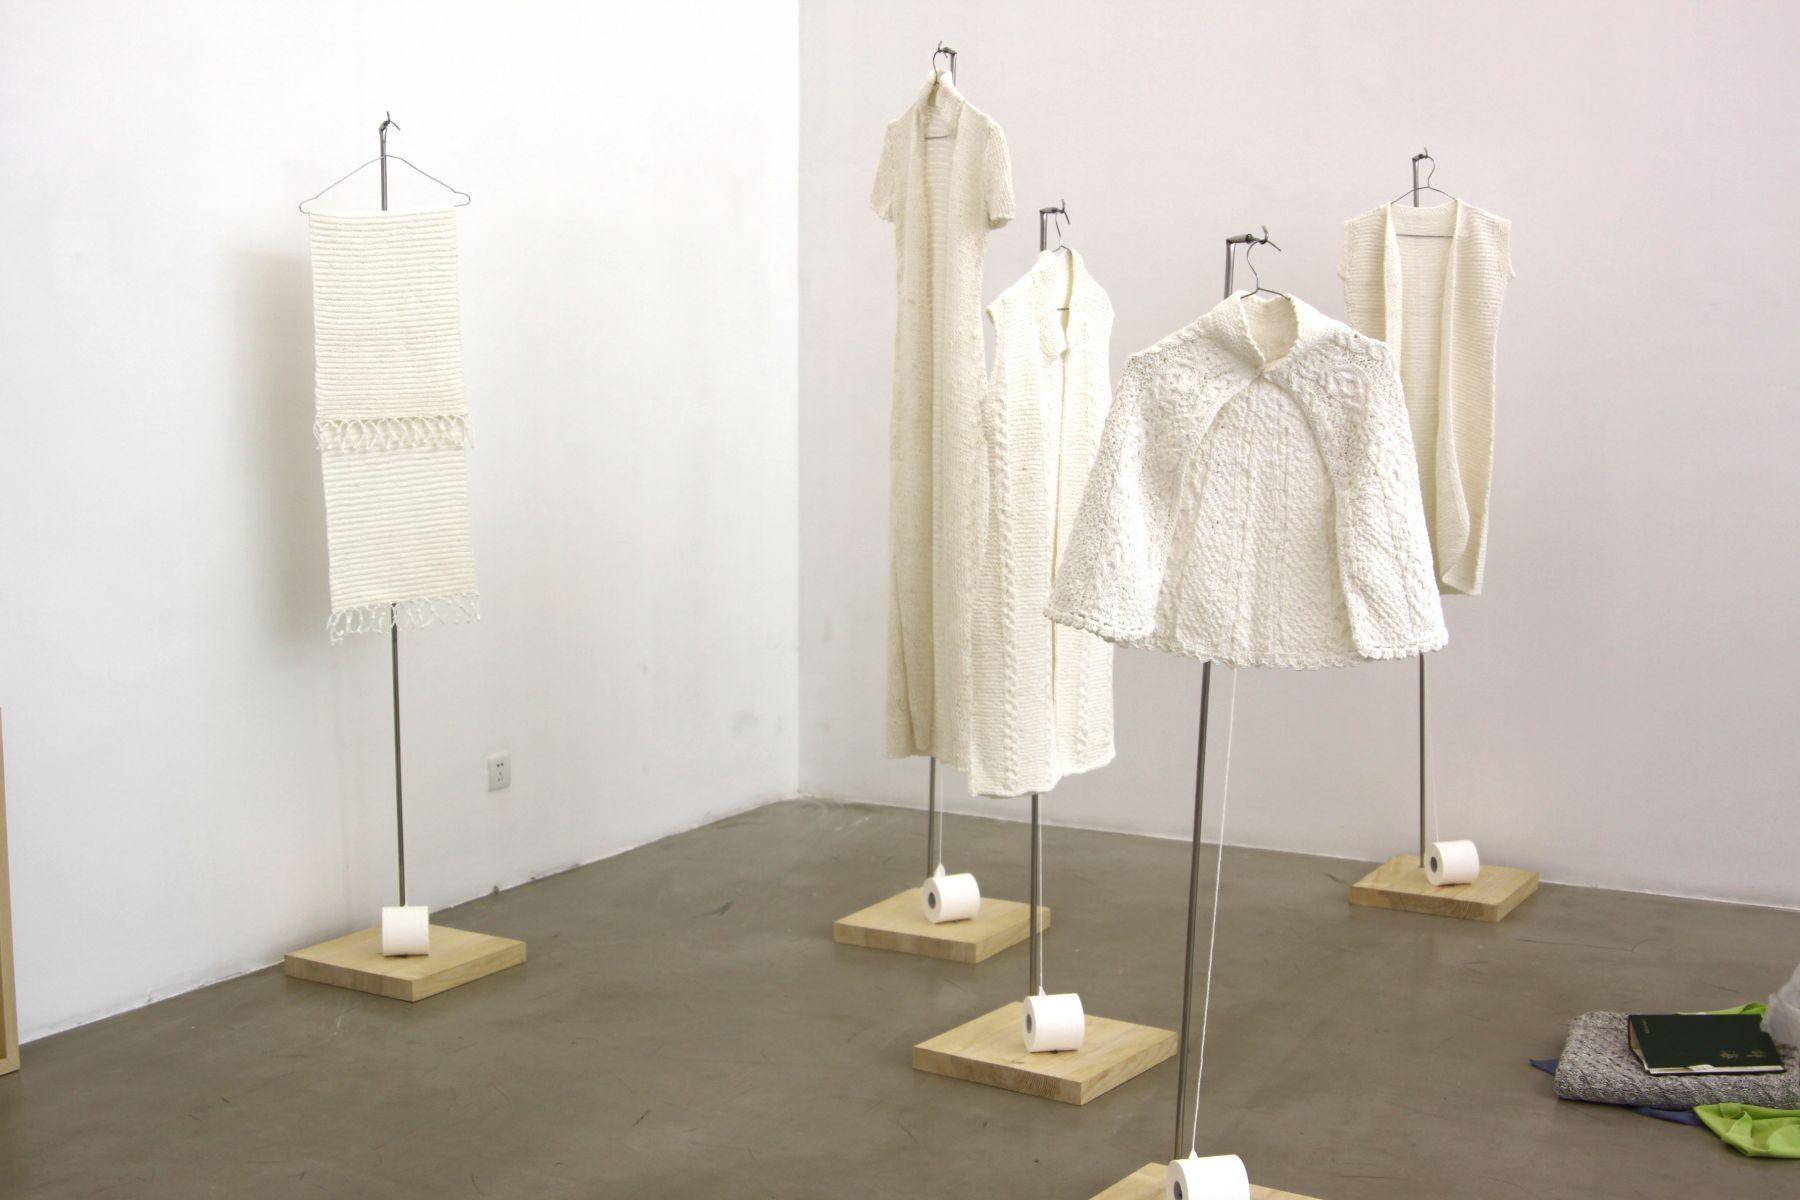 Wang LeiçŽ‹é›·, Hand-Woven Toilet Paper(including 5 pieces)æ‰‹ç»‡æ‰‹çº¸(含5件)